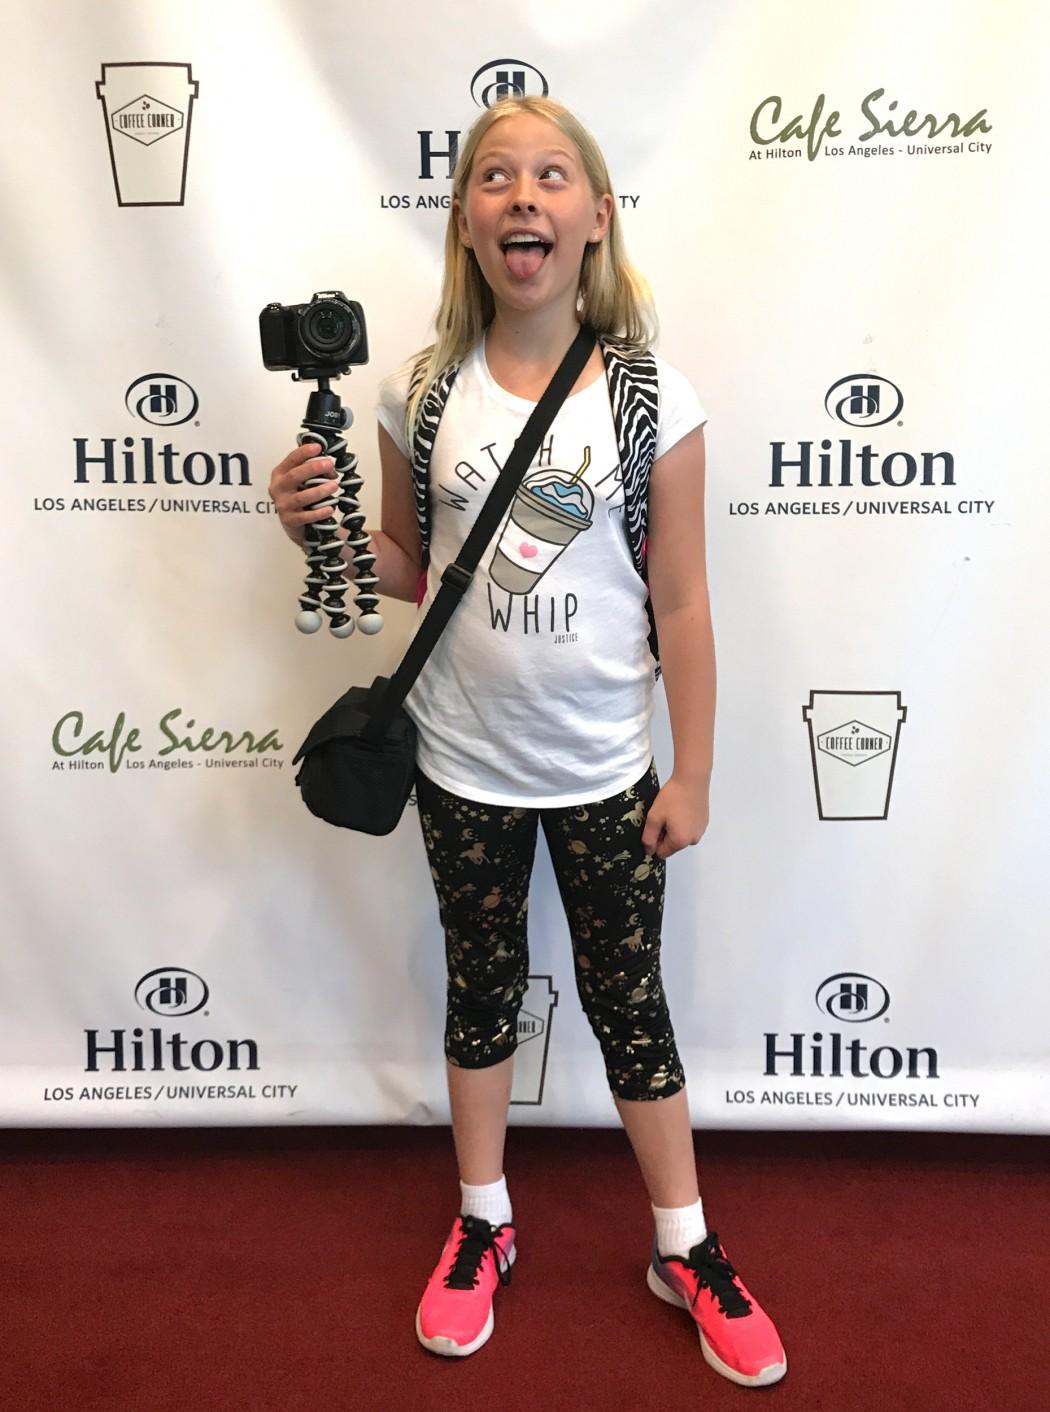 Alison, video producer extraordinaire